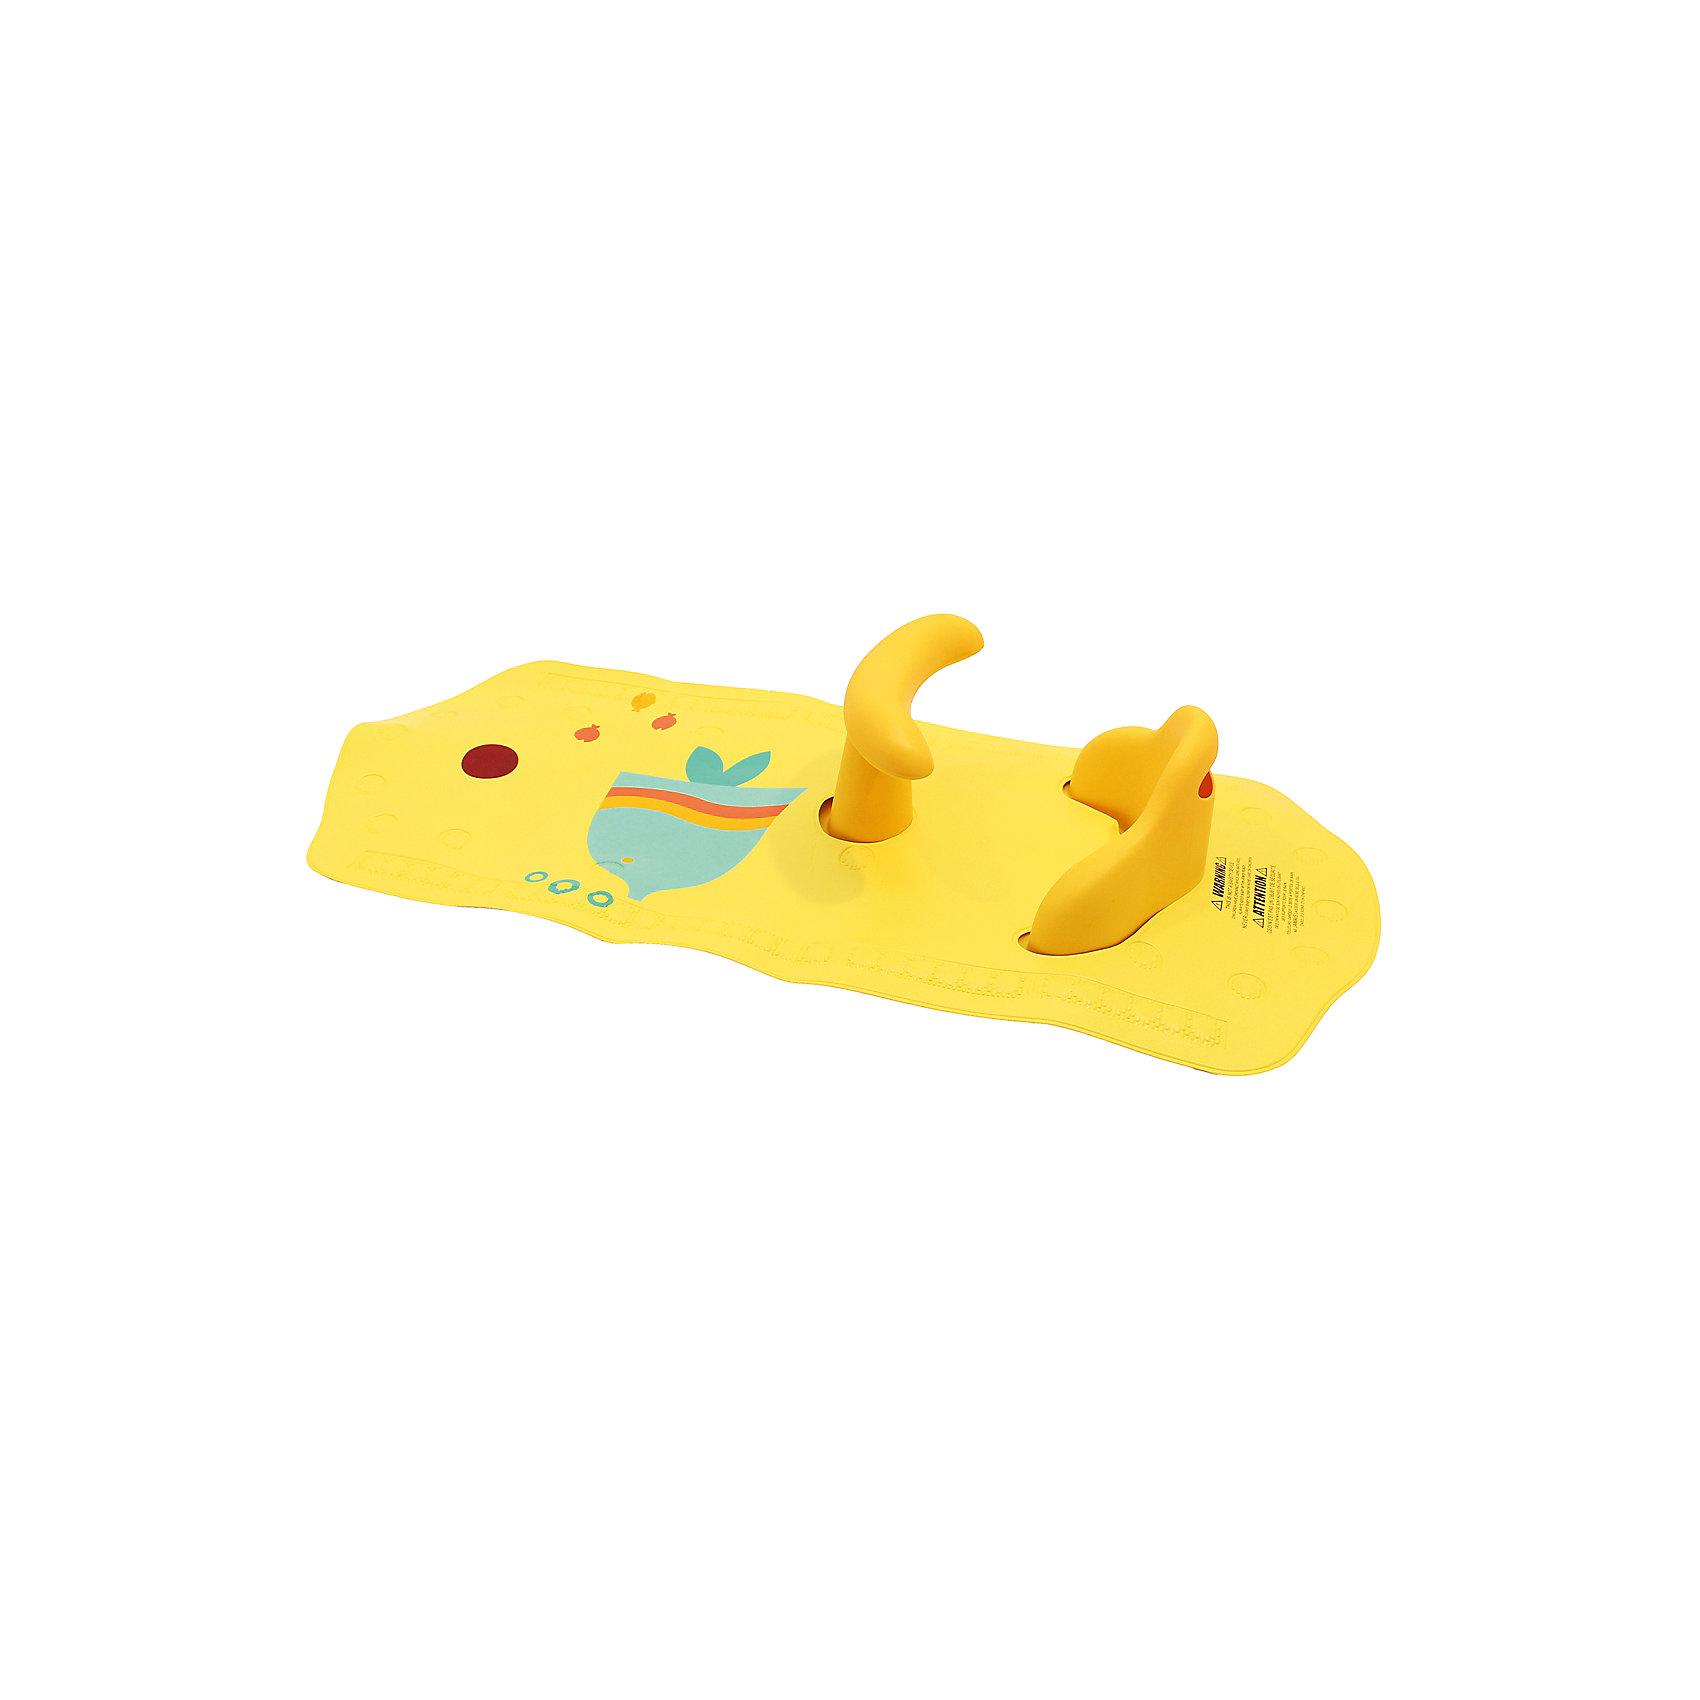 Roxy-Kids Коврик для ванной со съемным стульчиком ROXY-KIDS, Рыбка roxy kids круг для купания kengu